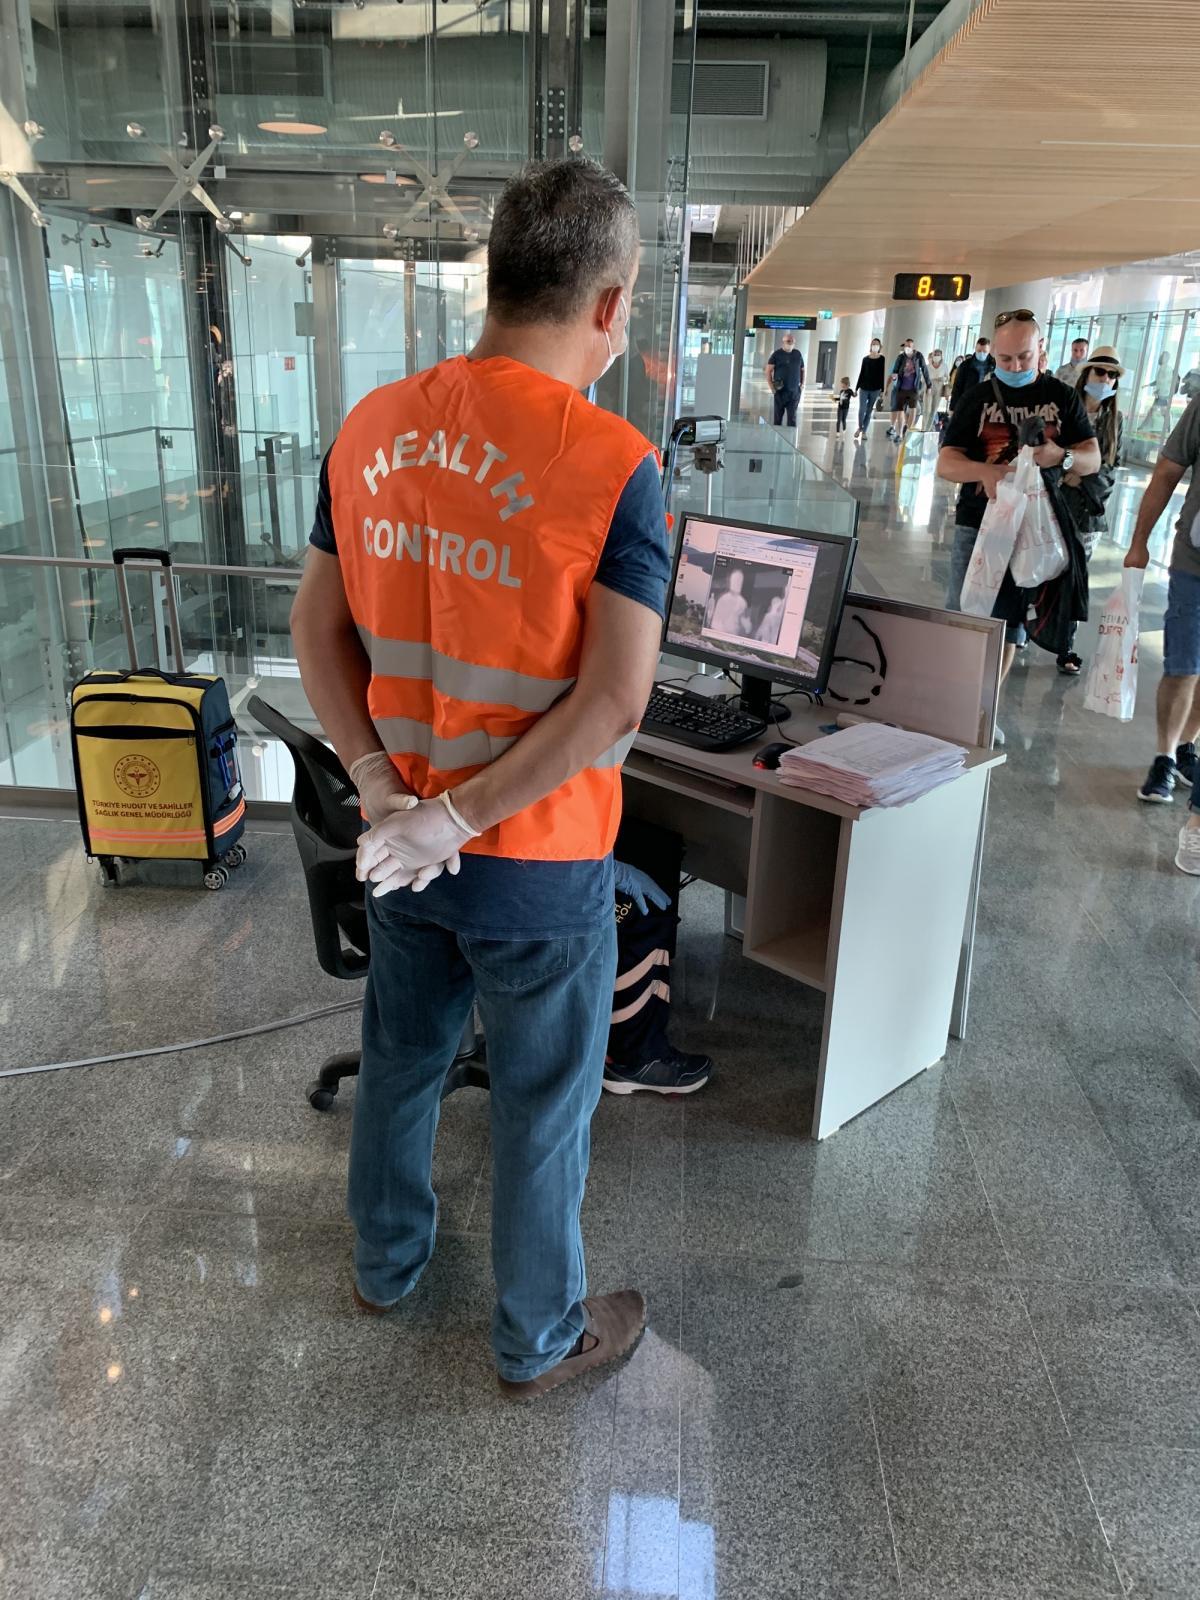 Monitoring of passengers' body temperature at Dalaman Airport